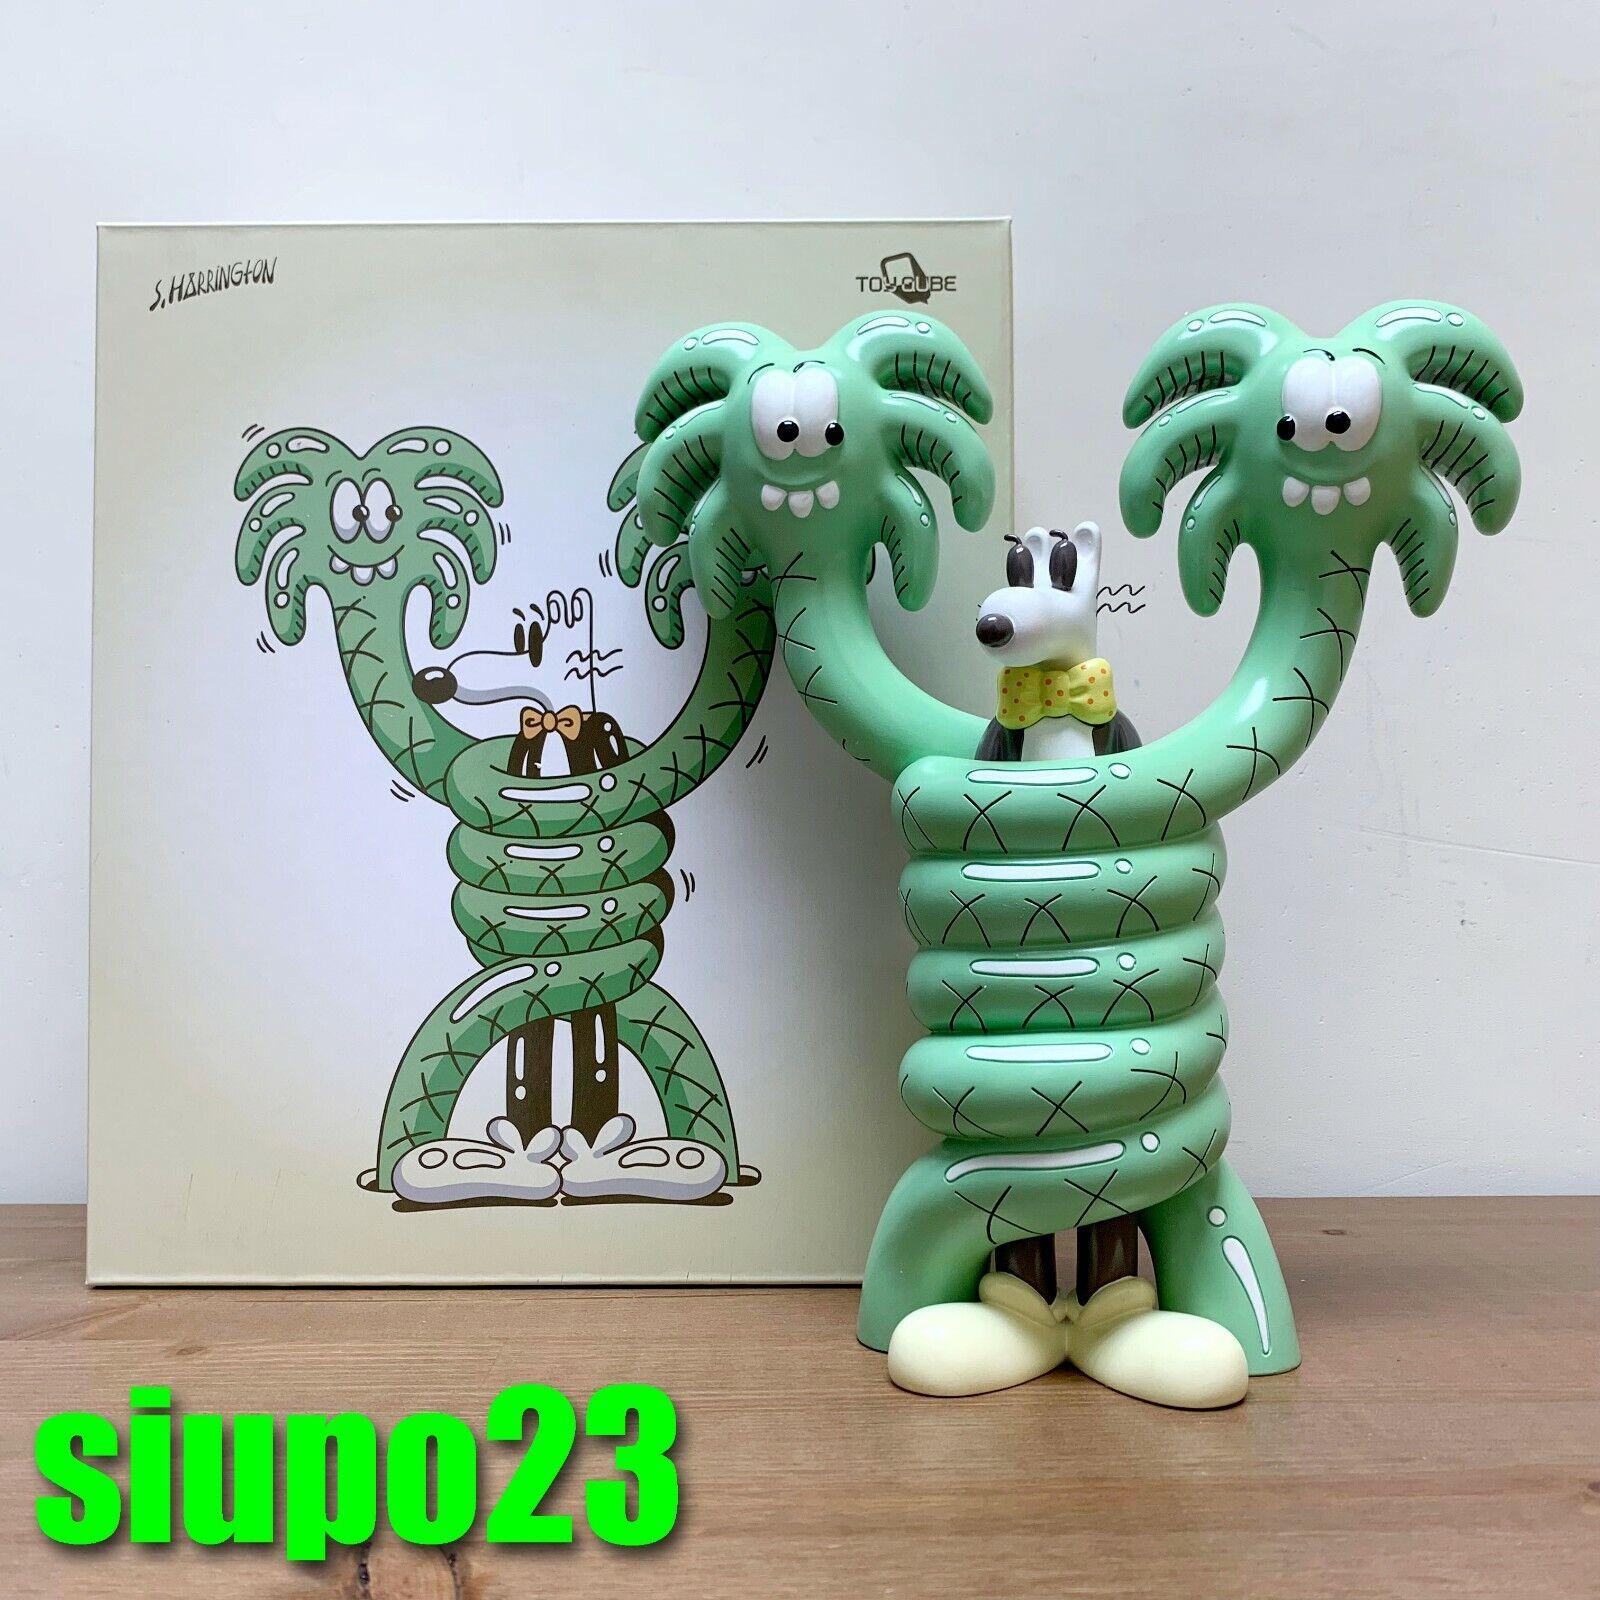 Toy Qube X Steven Harrington  GOTCHA  Sculpture vintage Edition